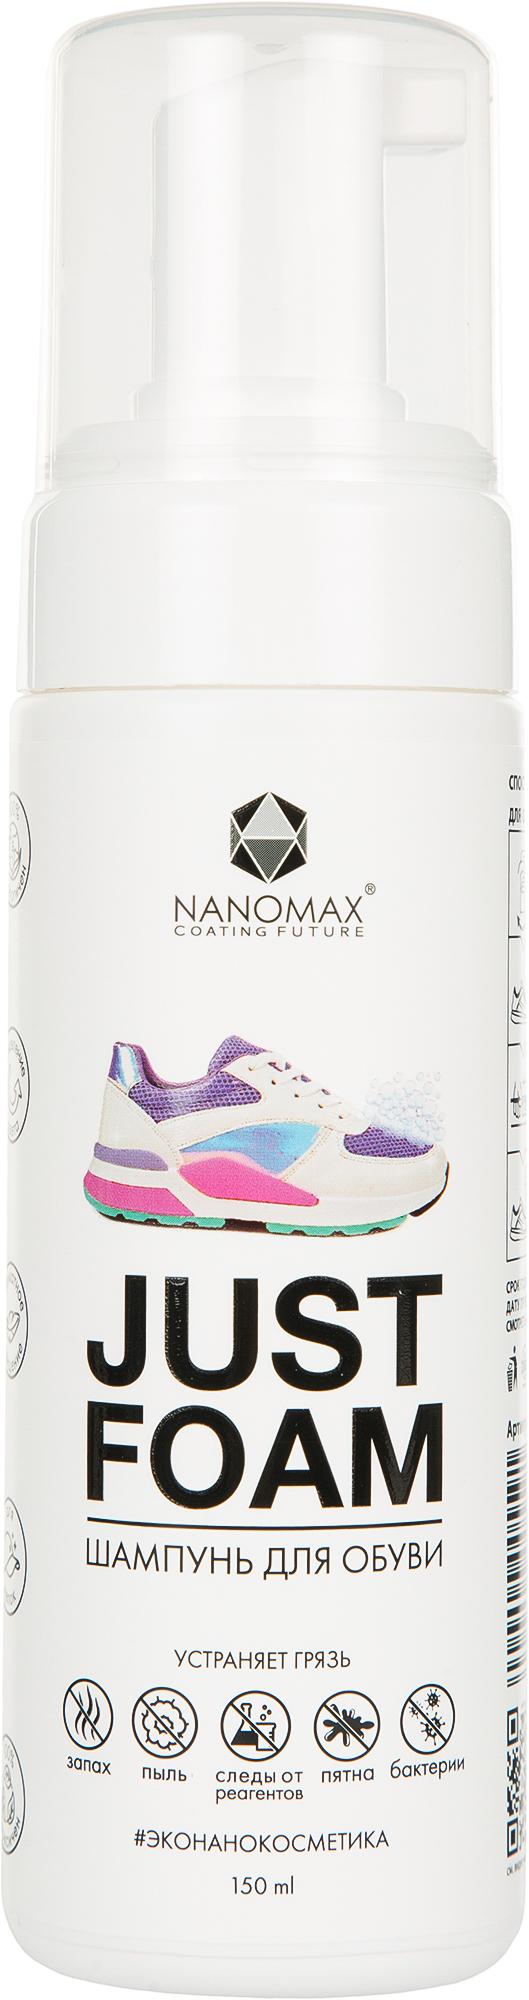 Nanomax Средство для ухода за обувью Just Foam